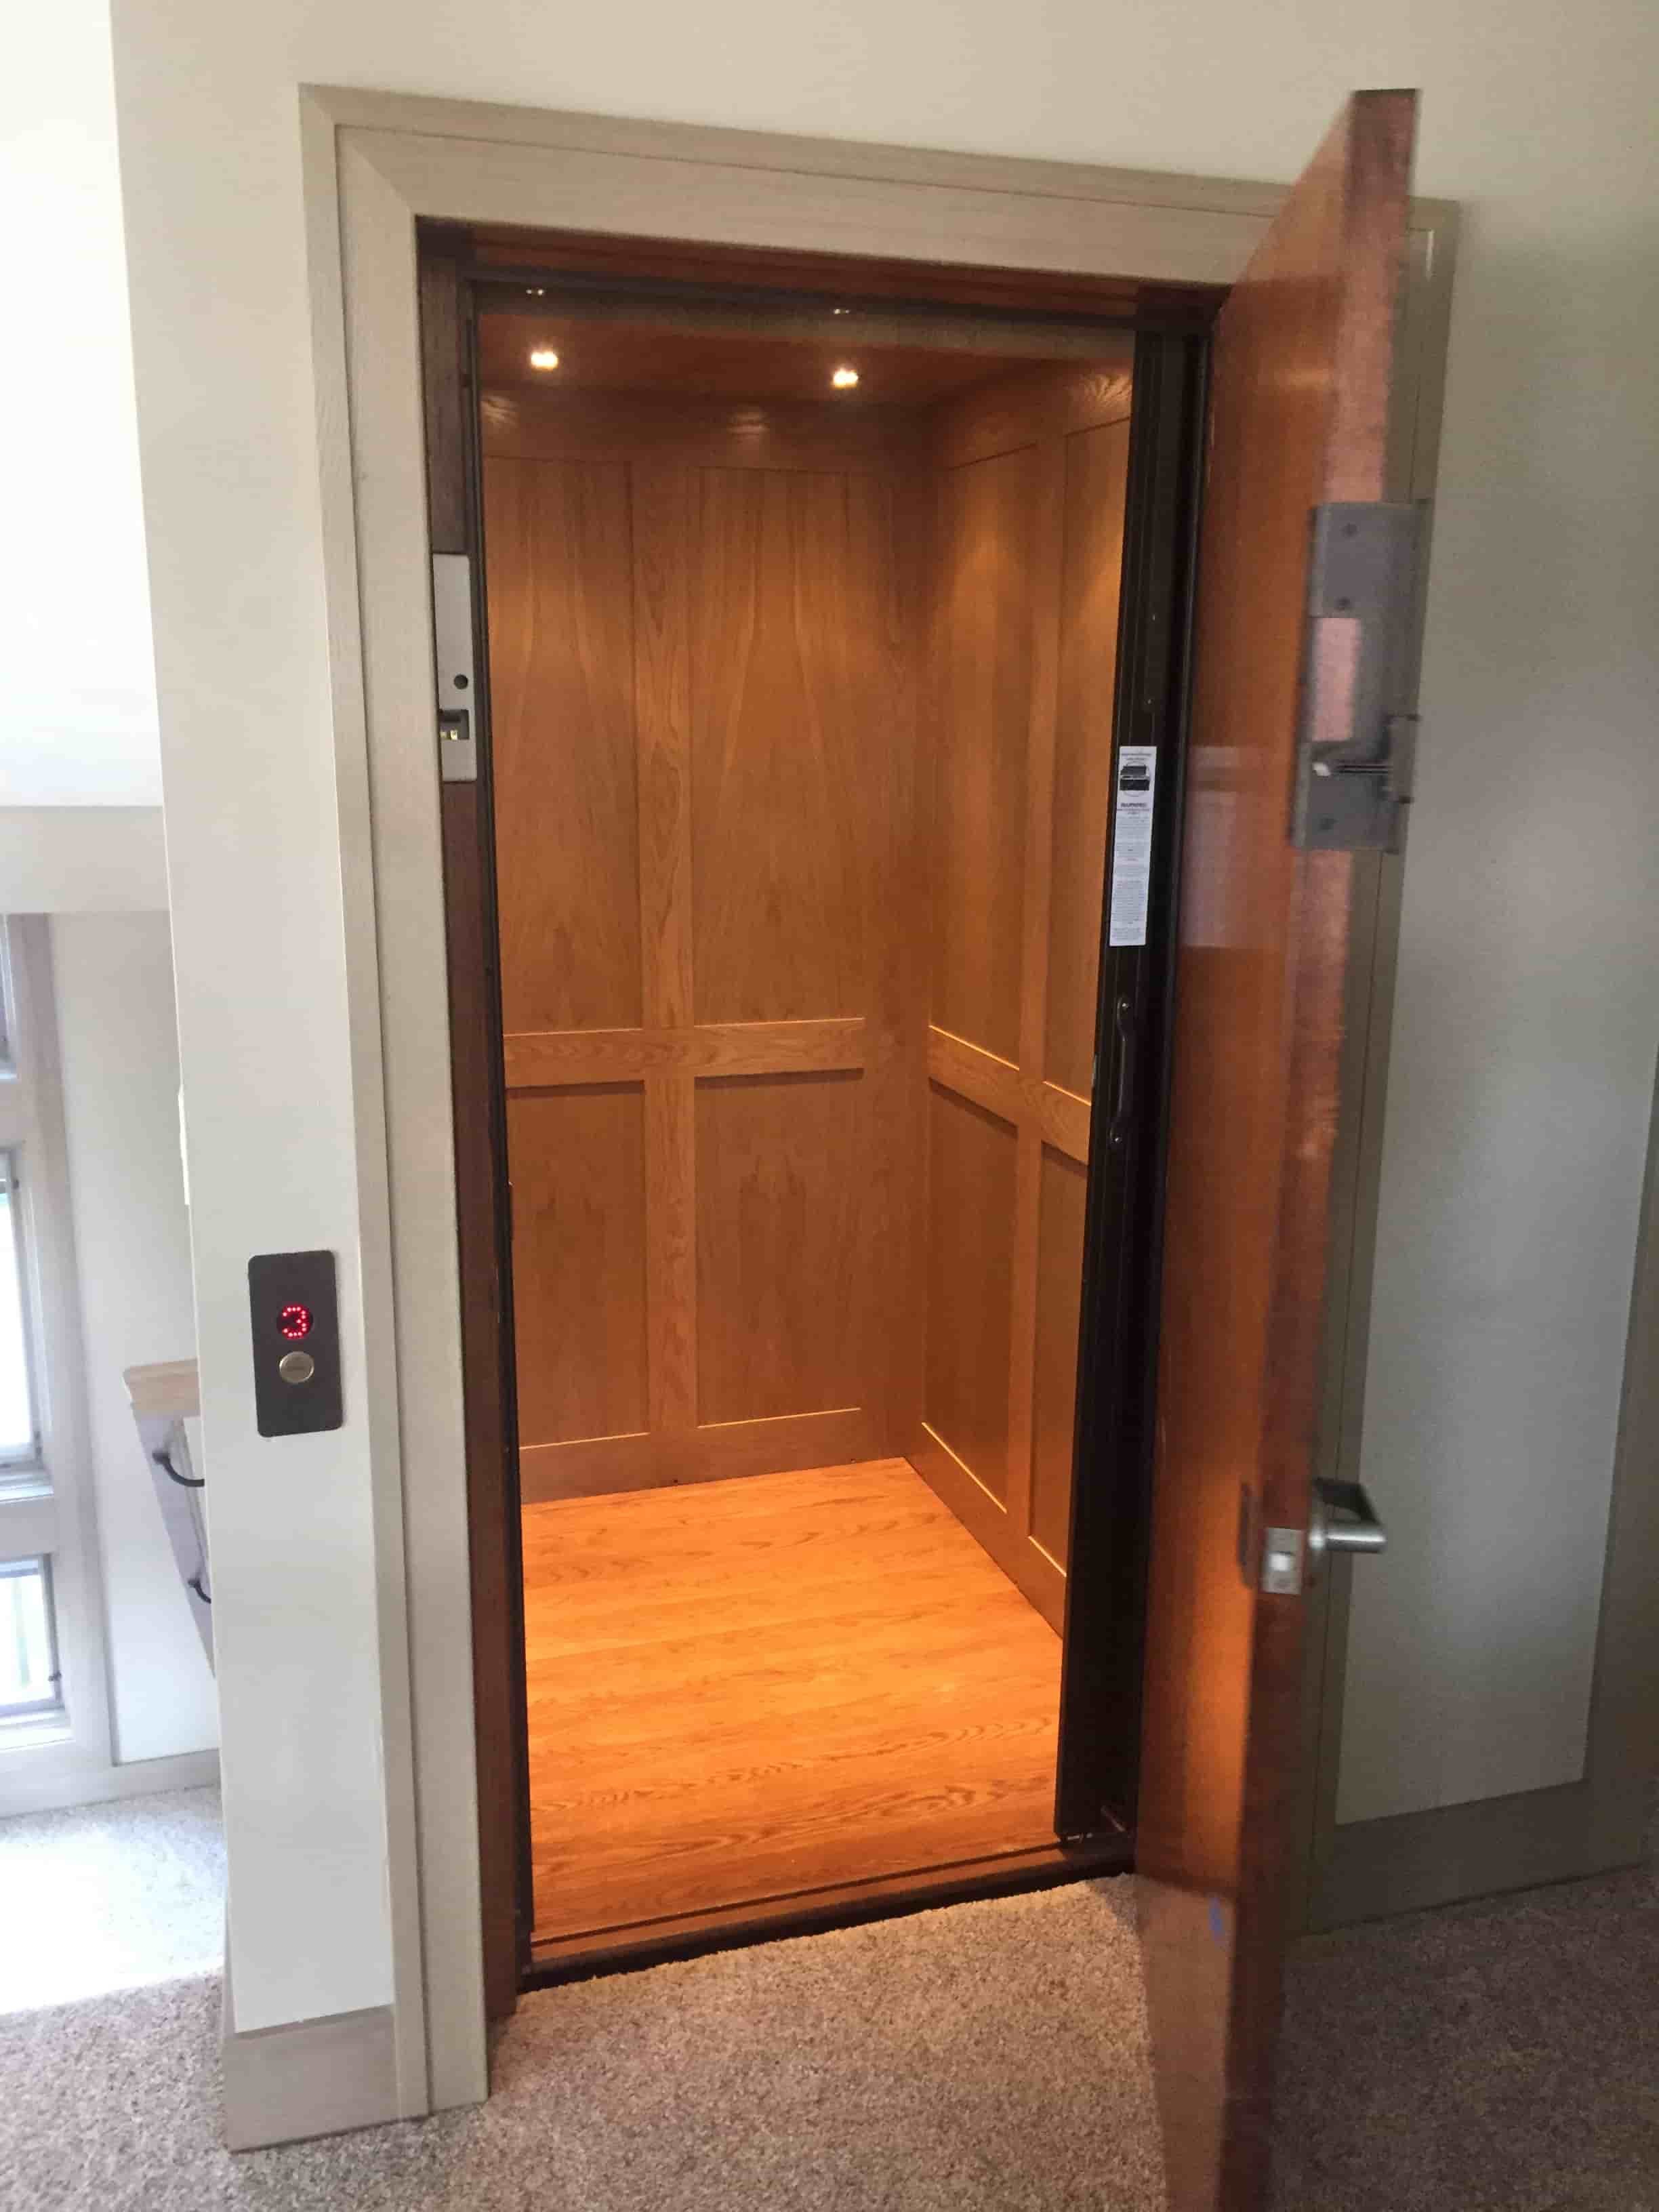 Wisconsin_Residential_Elevator_1-min.jpg